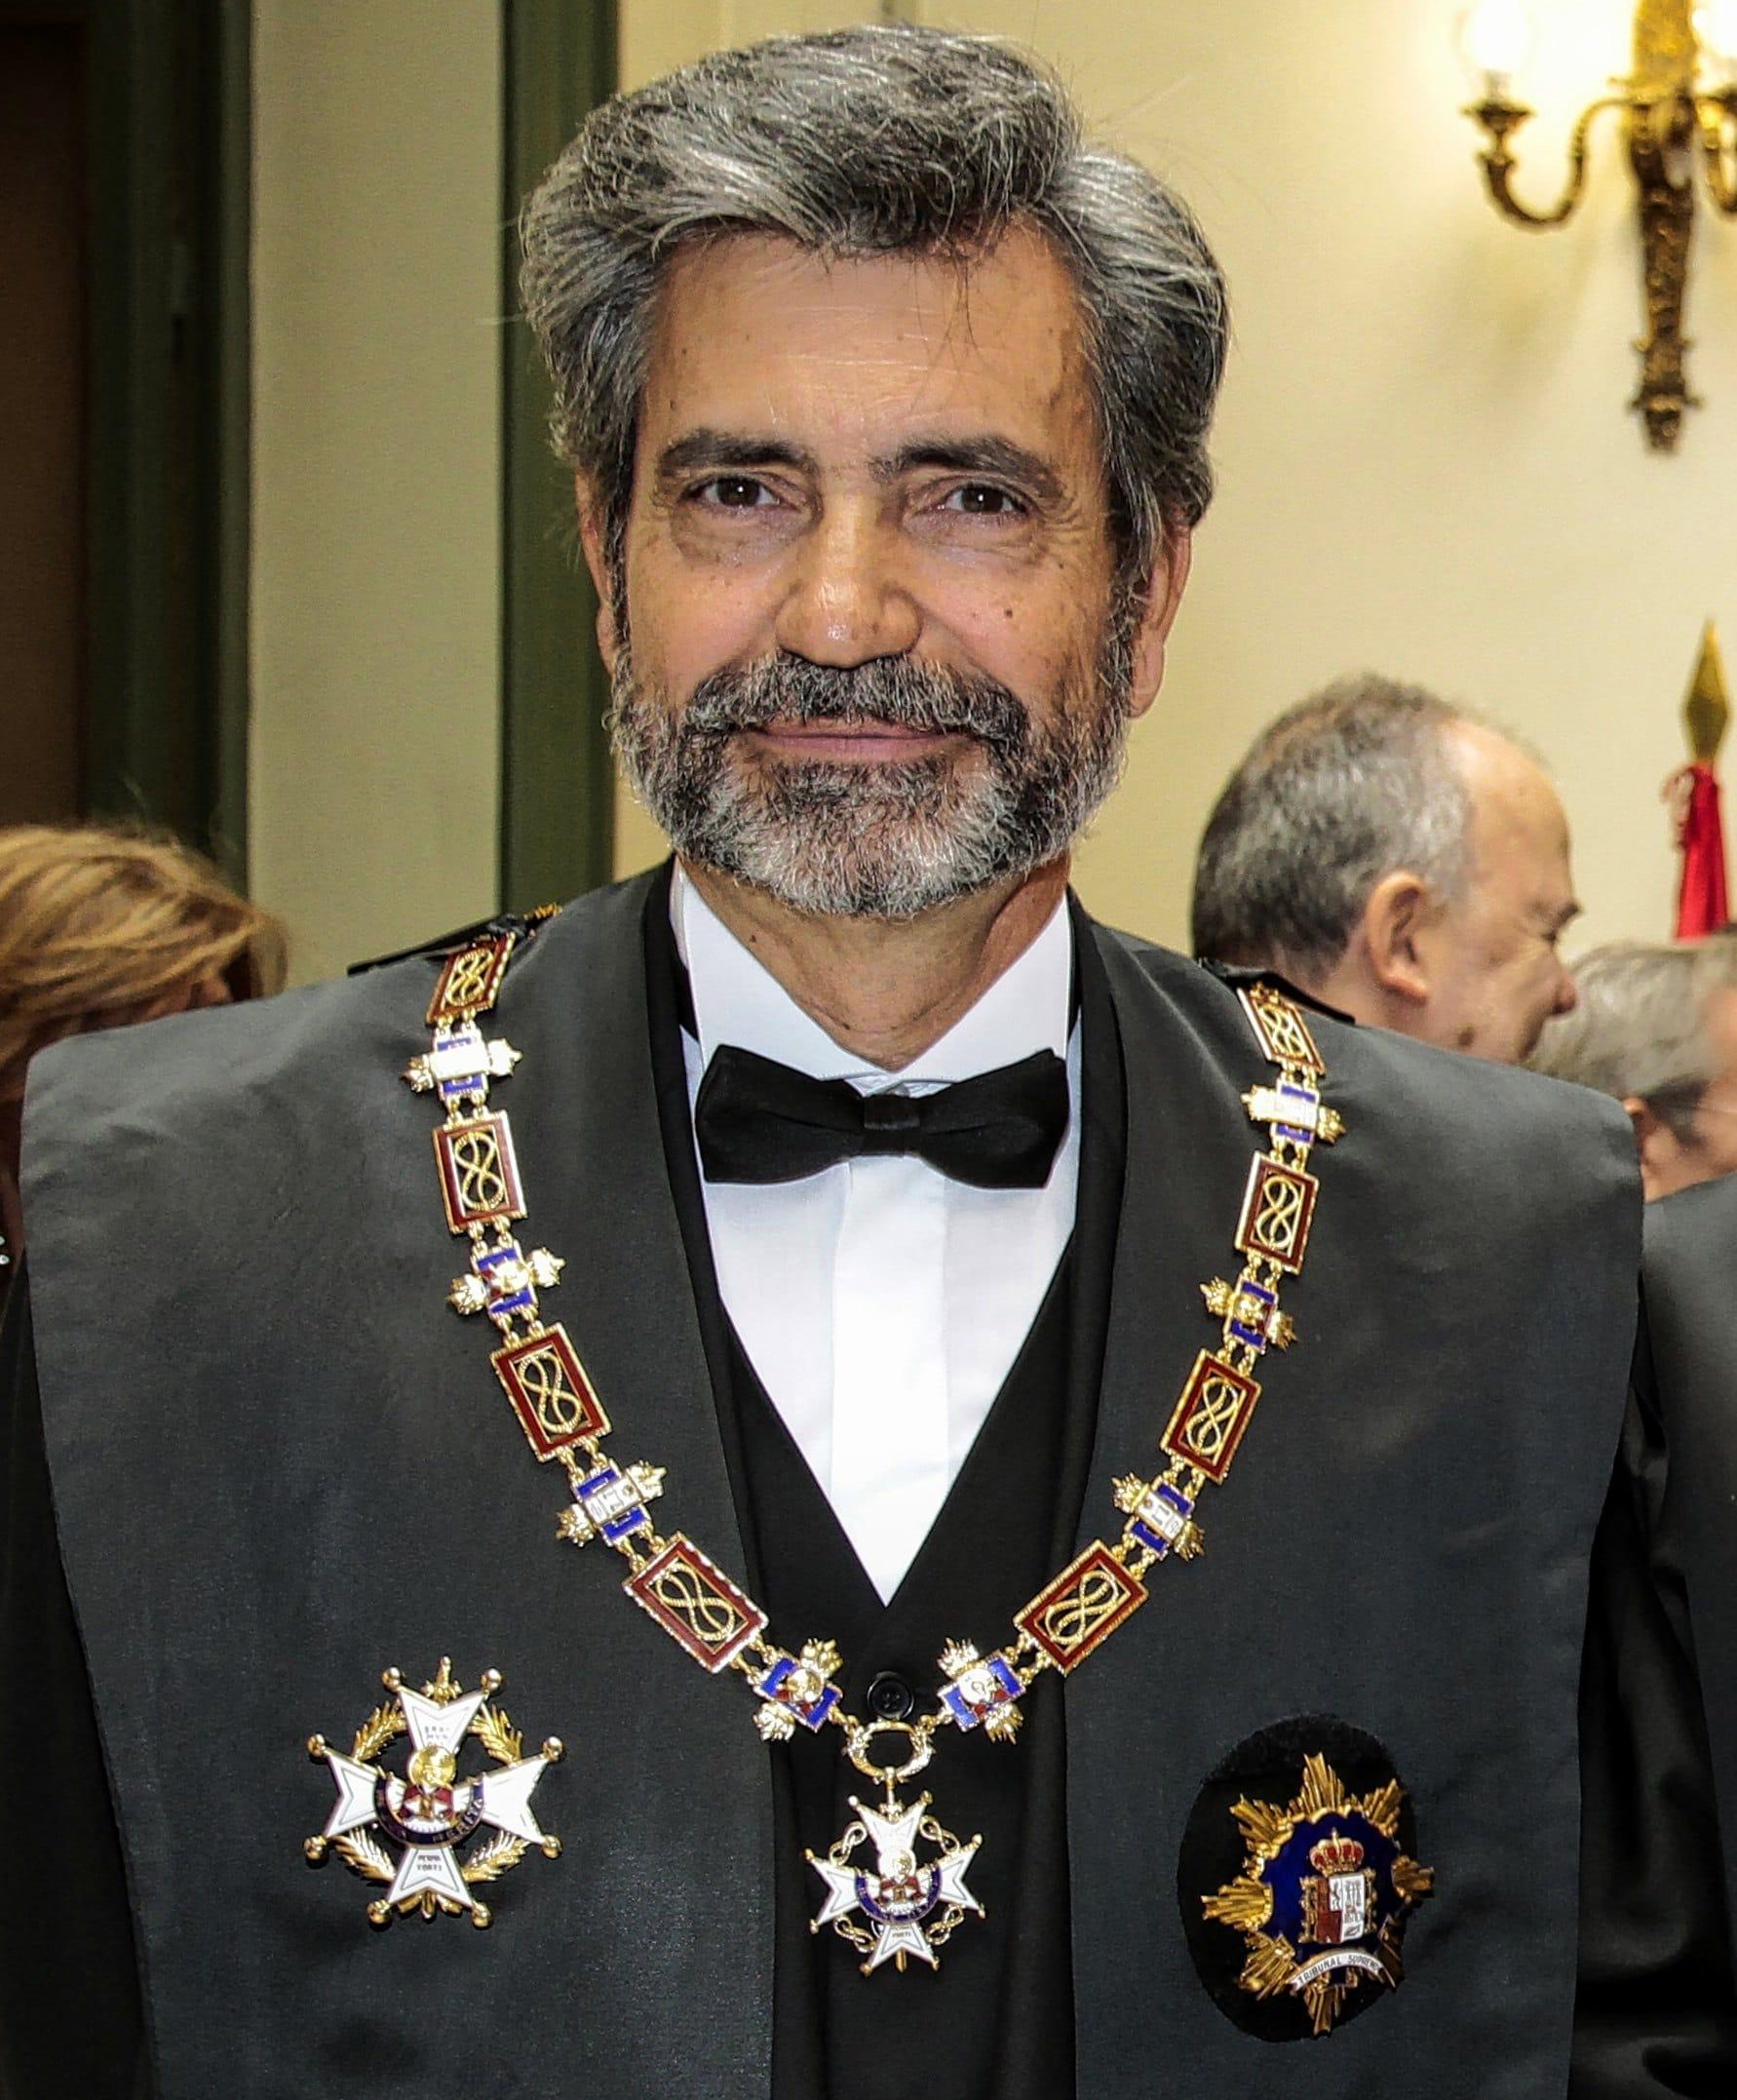 Carlos Lesmes Serrano